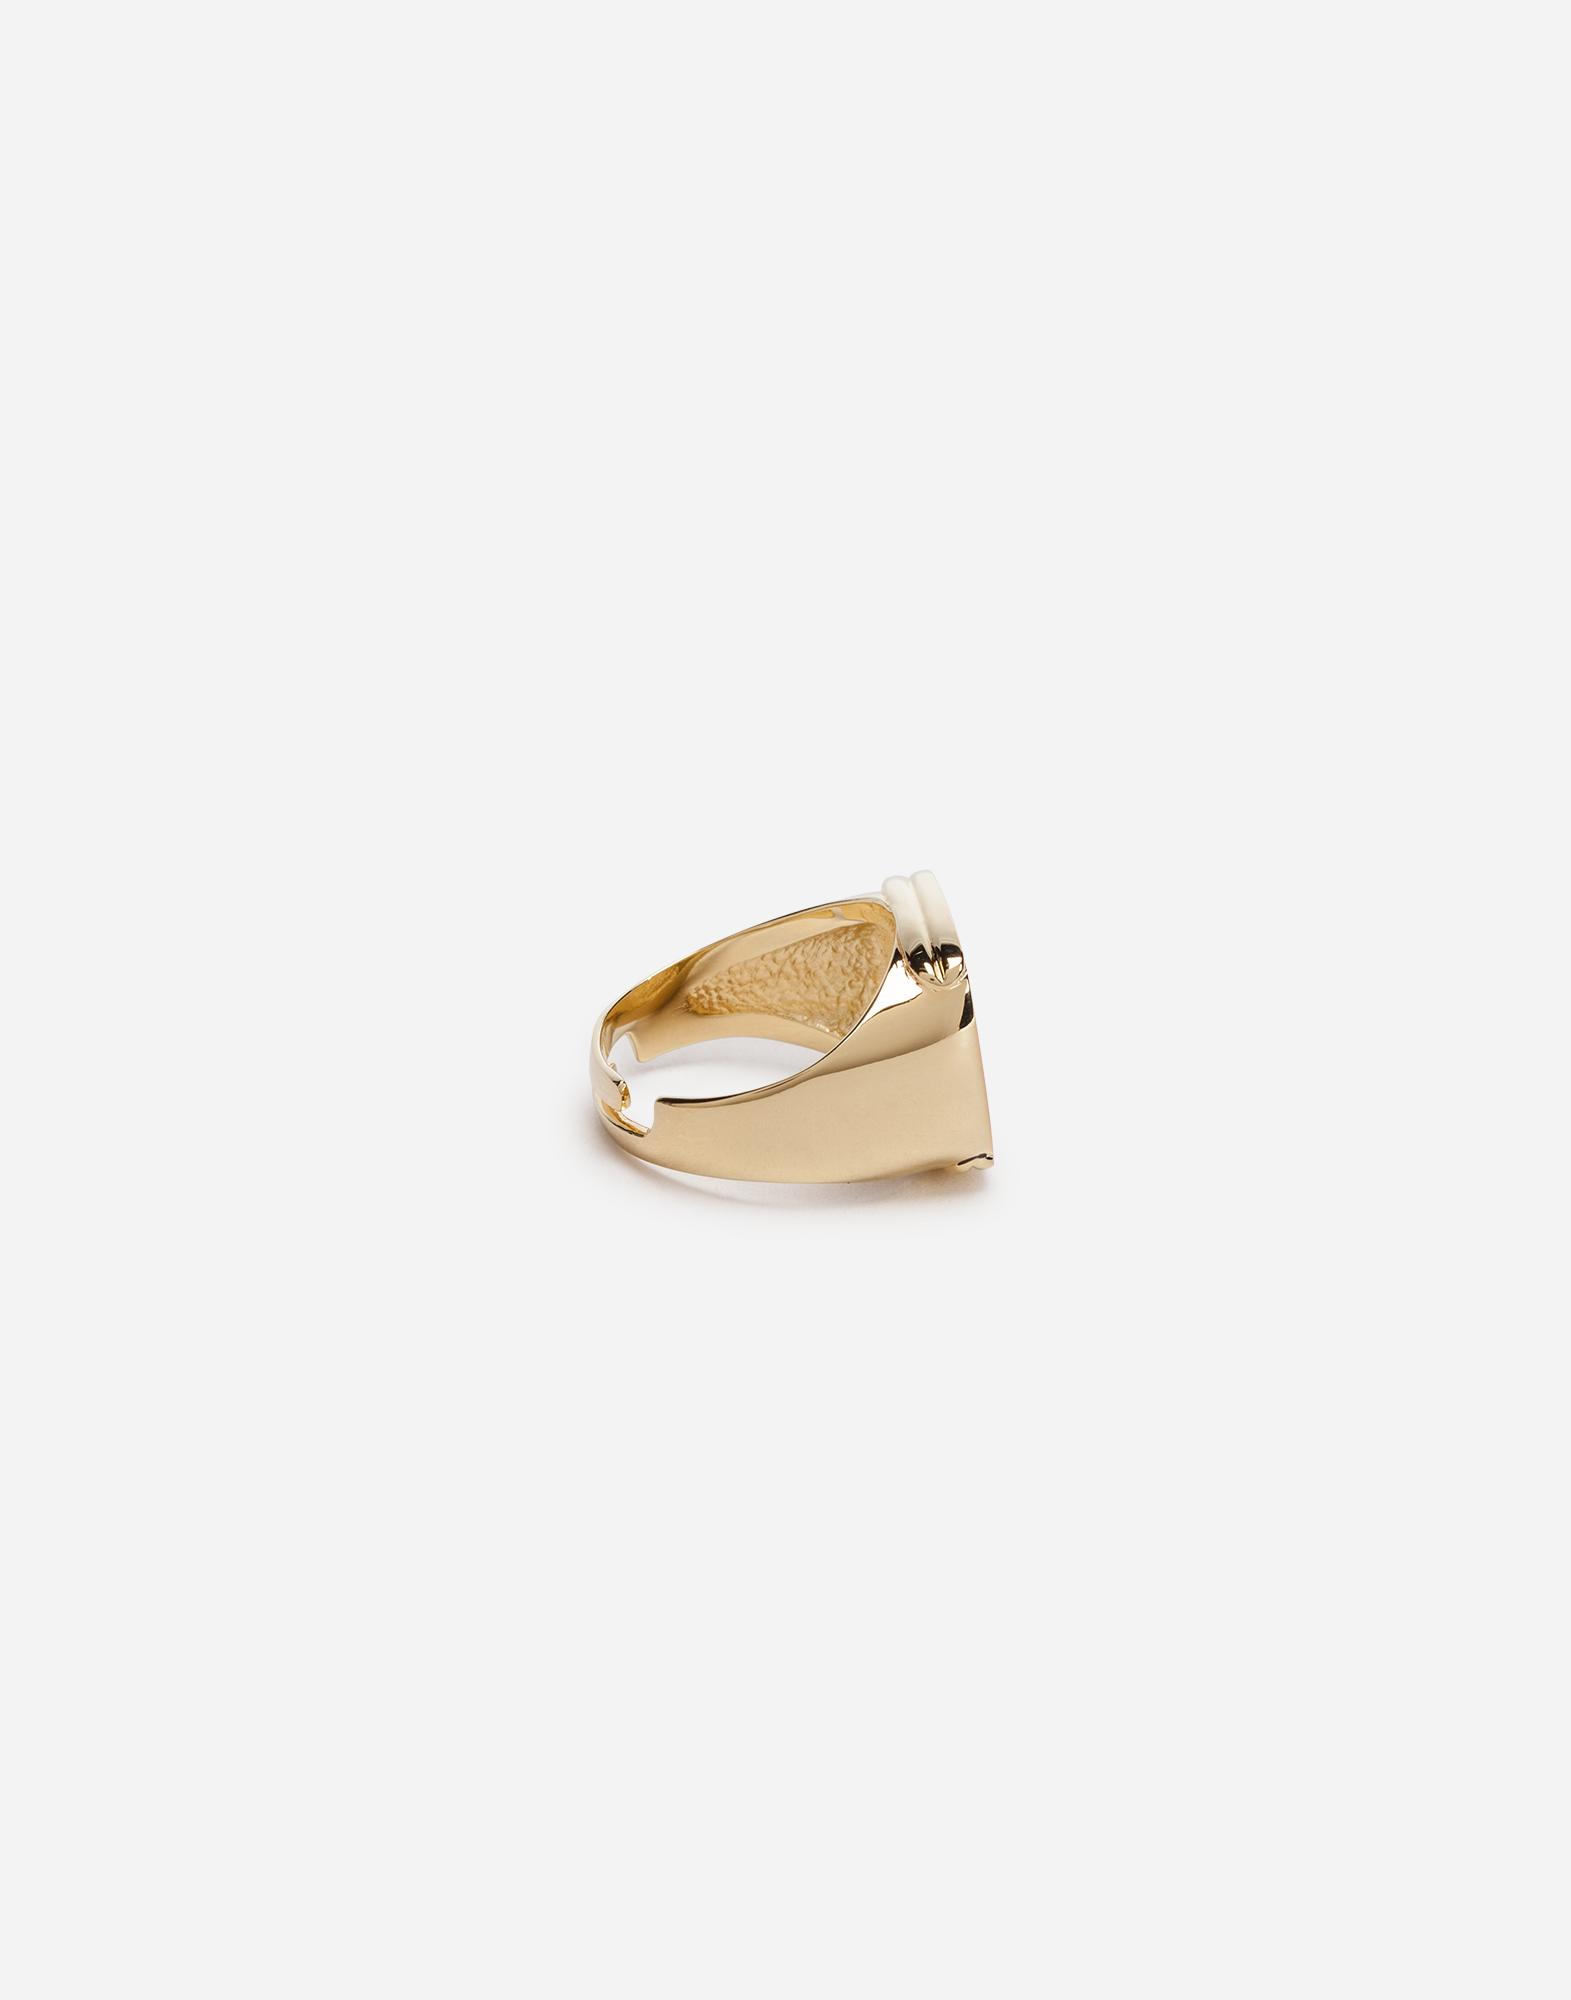 Dolce & Gabbana RING WITH LOGO